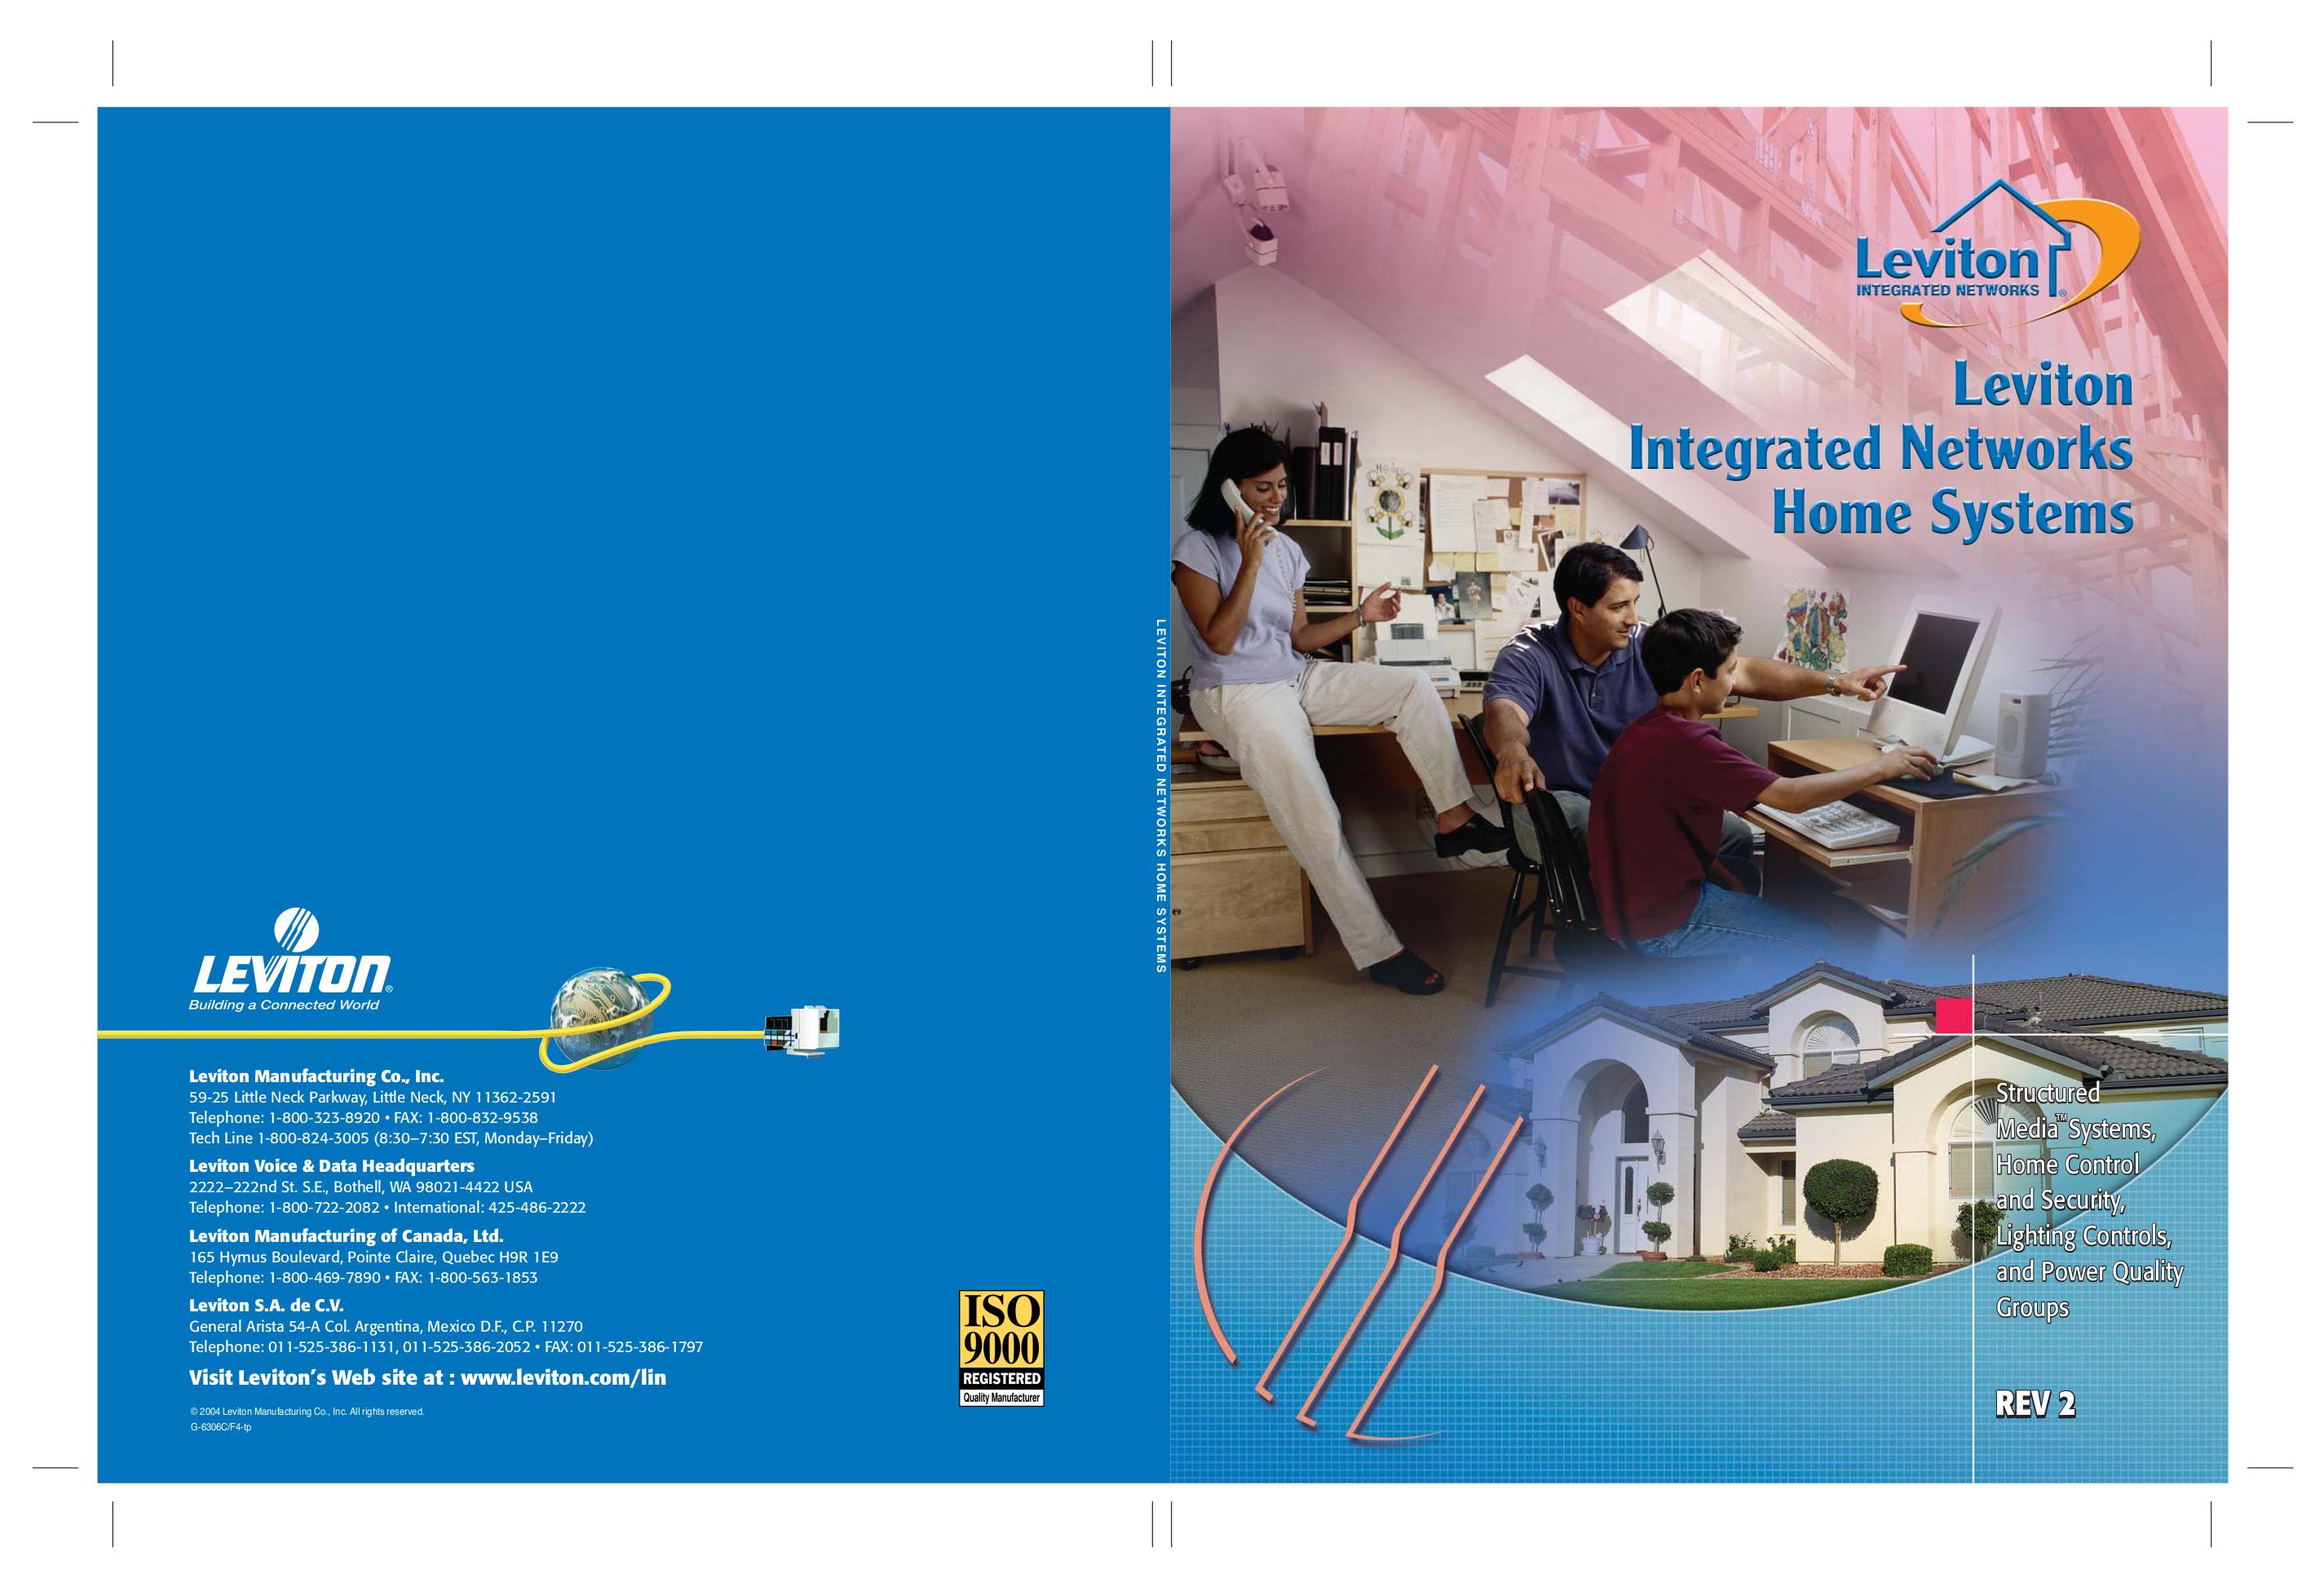 Download free pdf for Leviton HCCUR Remote Control manual